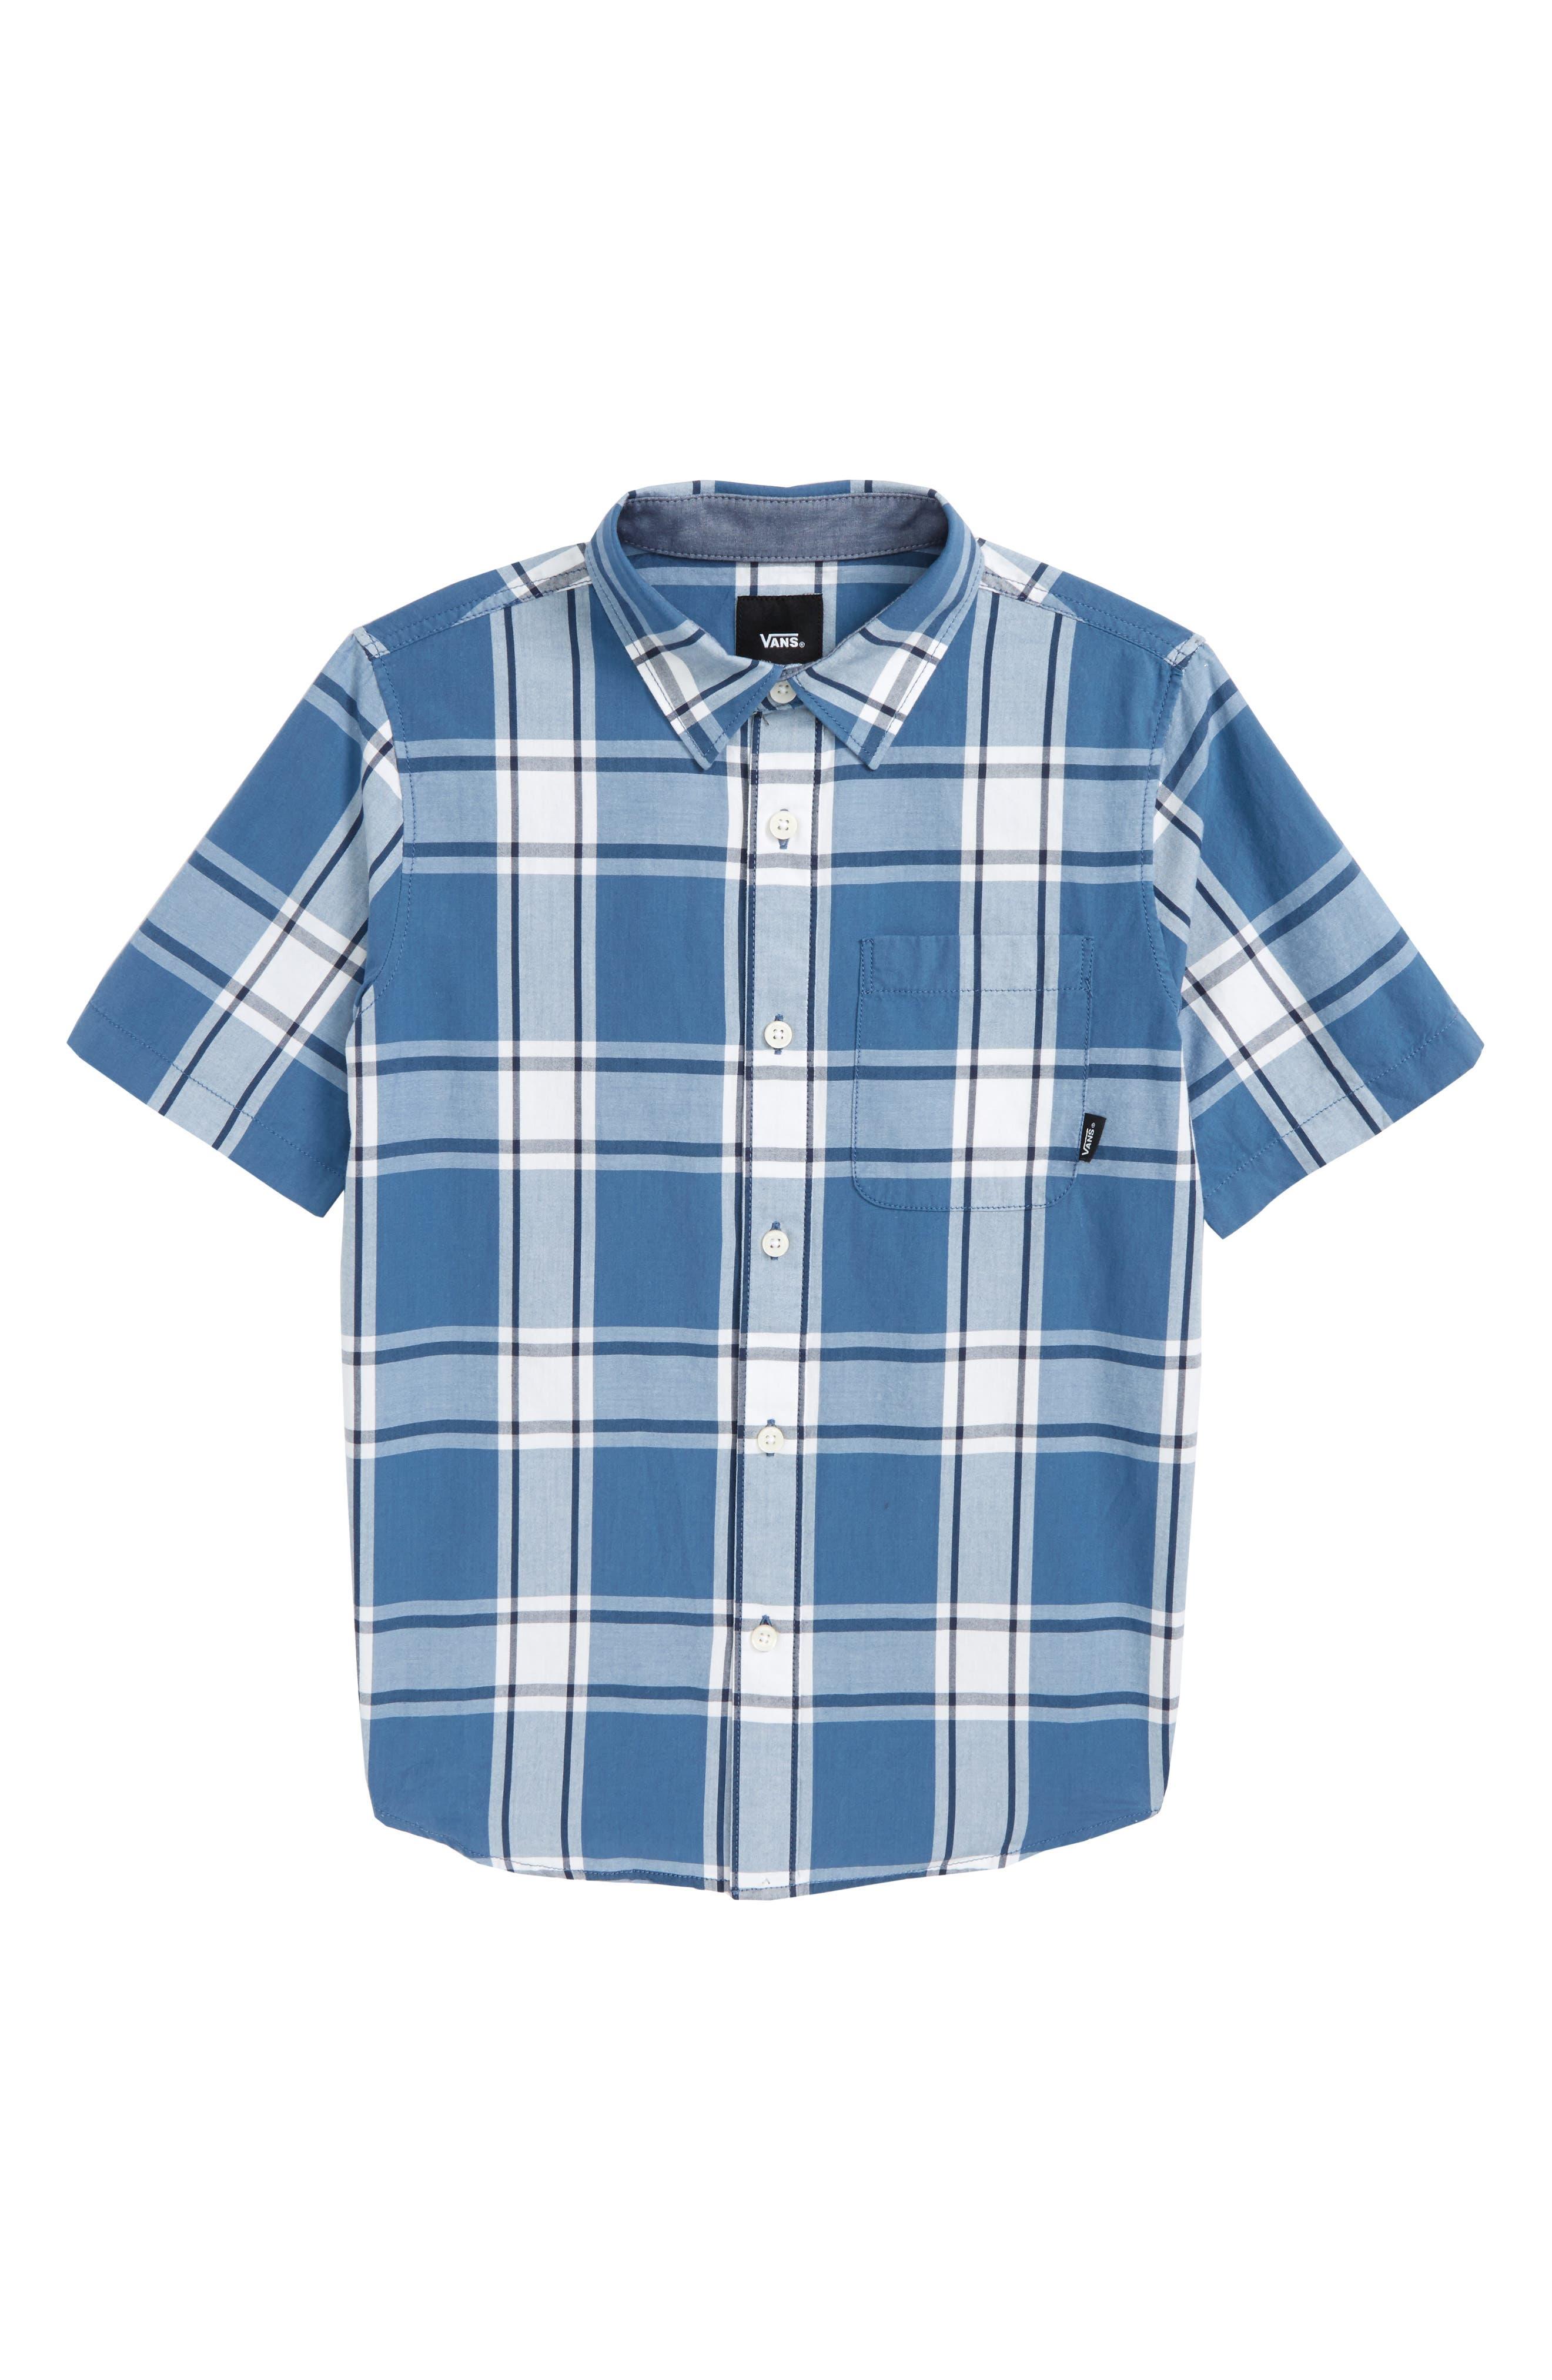 Mayfield Plaid Woven Shirt,                             Main thumbnail 1, color,                             420